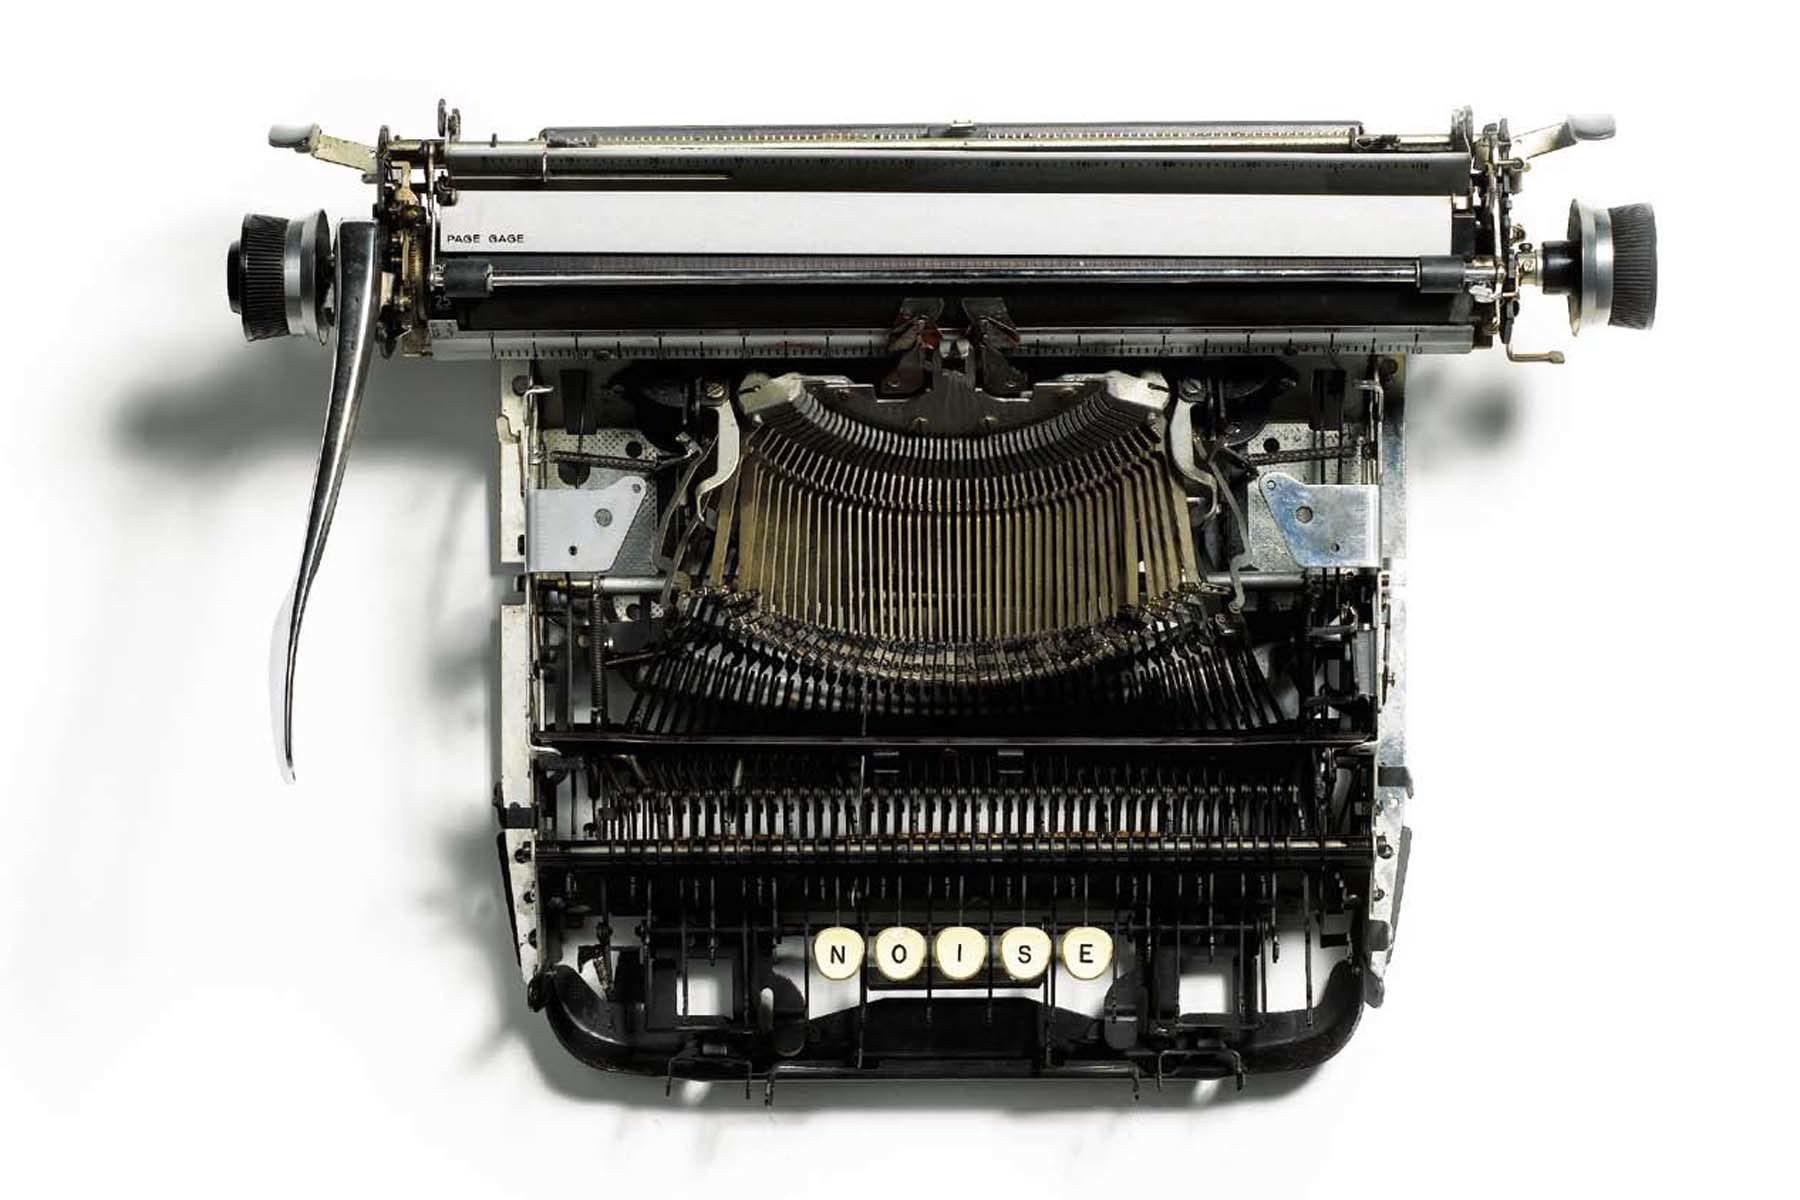 Jacopo Mazzonelli, Noise, 2010, typewriter, 44 x 31 x 13 cm